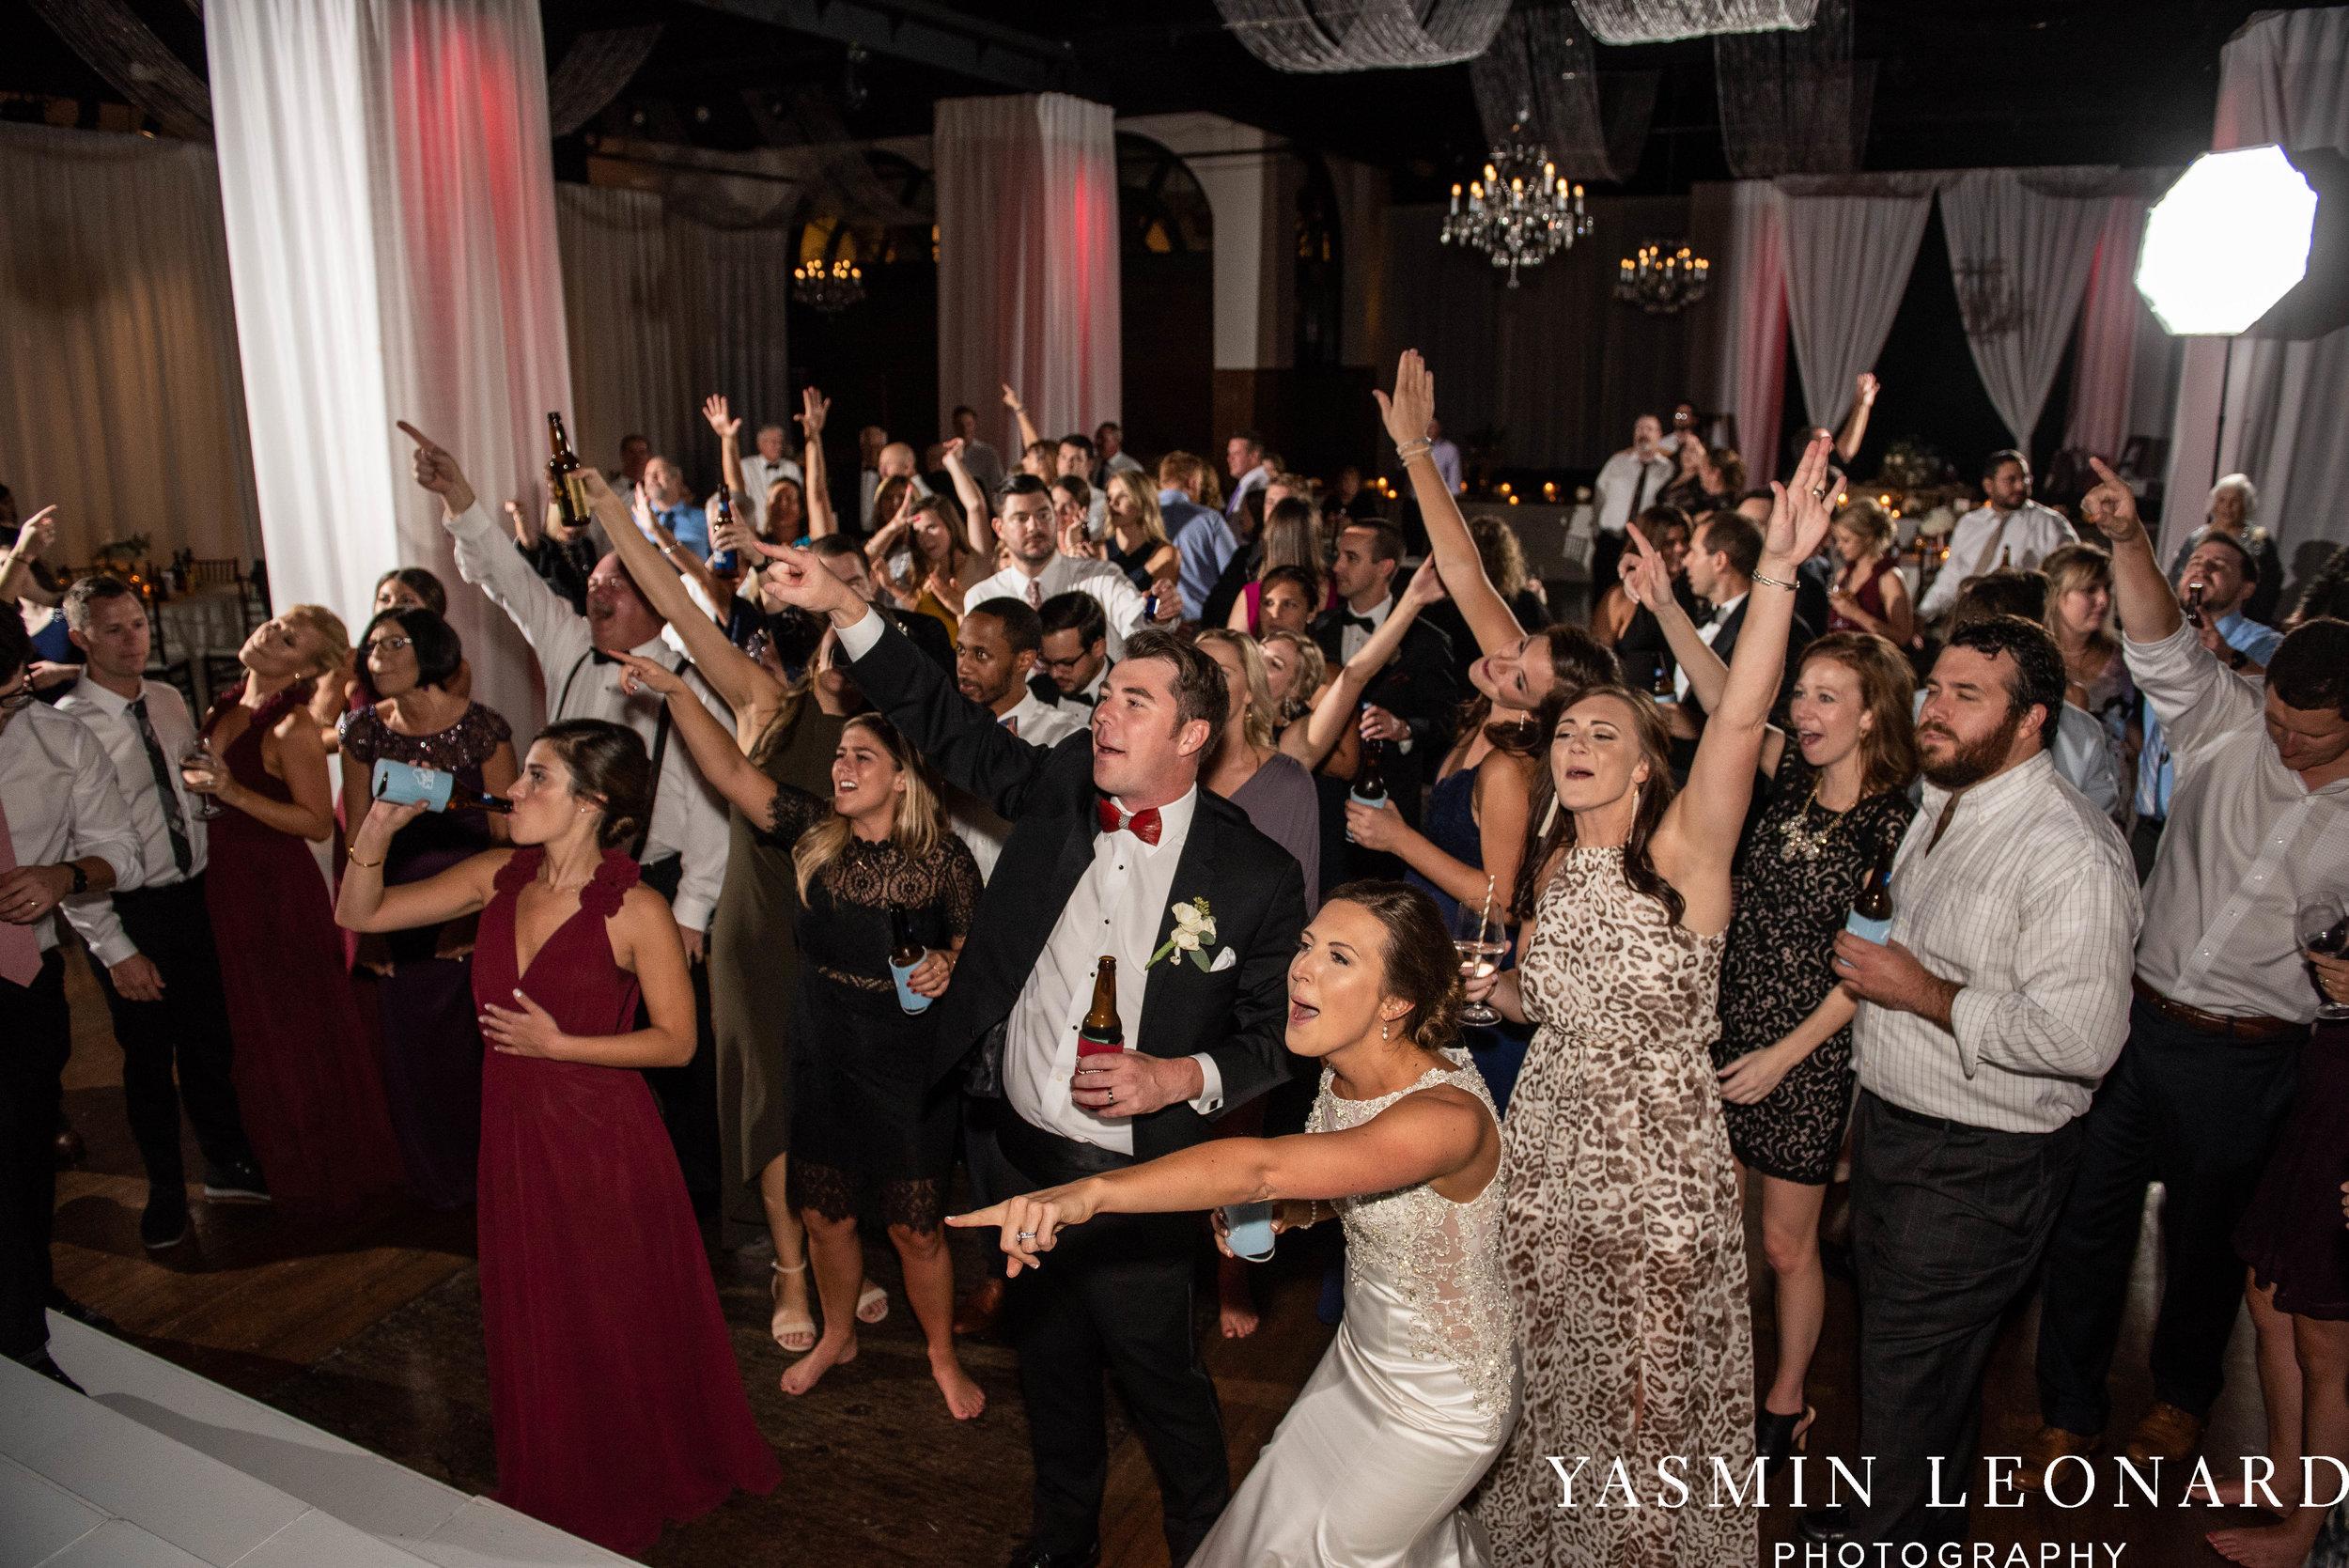 Millennium Center Wedding - Downtown Winston Salem - Winston Salem Wedding Photographer - Winston Salem Venues - Indoor Wedding Venues - NC Wedding Photographer - Yasmin Leonard Photography-85.jpg